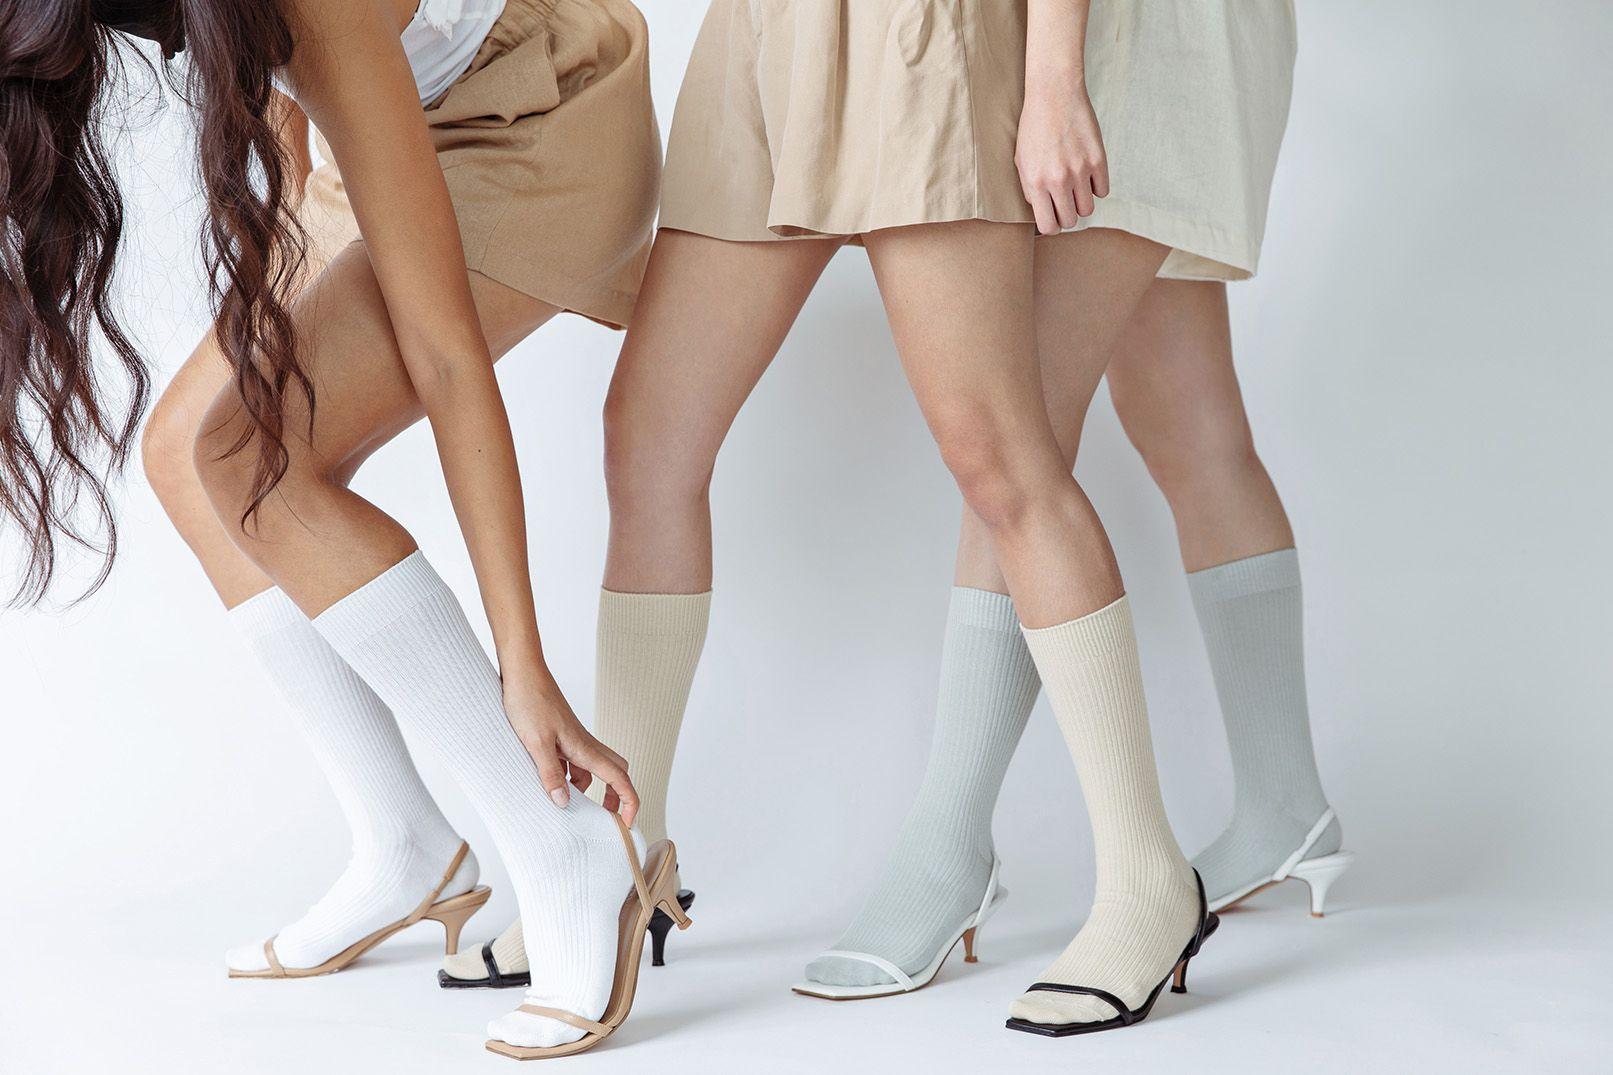 Vania Romoff Unveils New Line Of Stylish Yet Functional Footwear